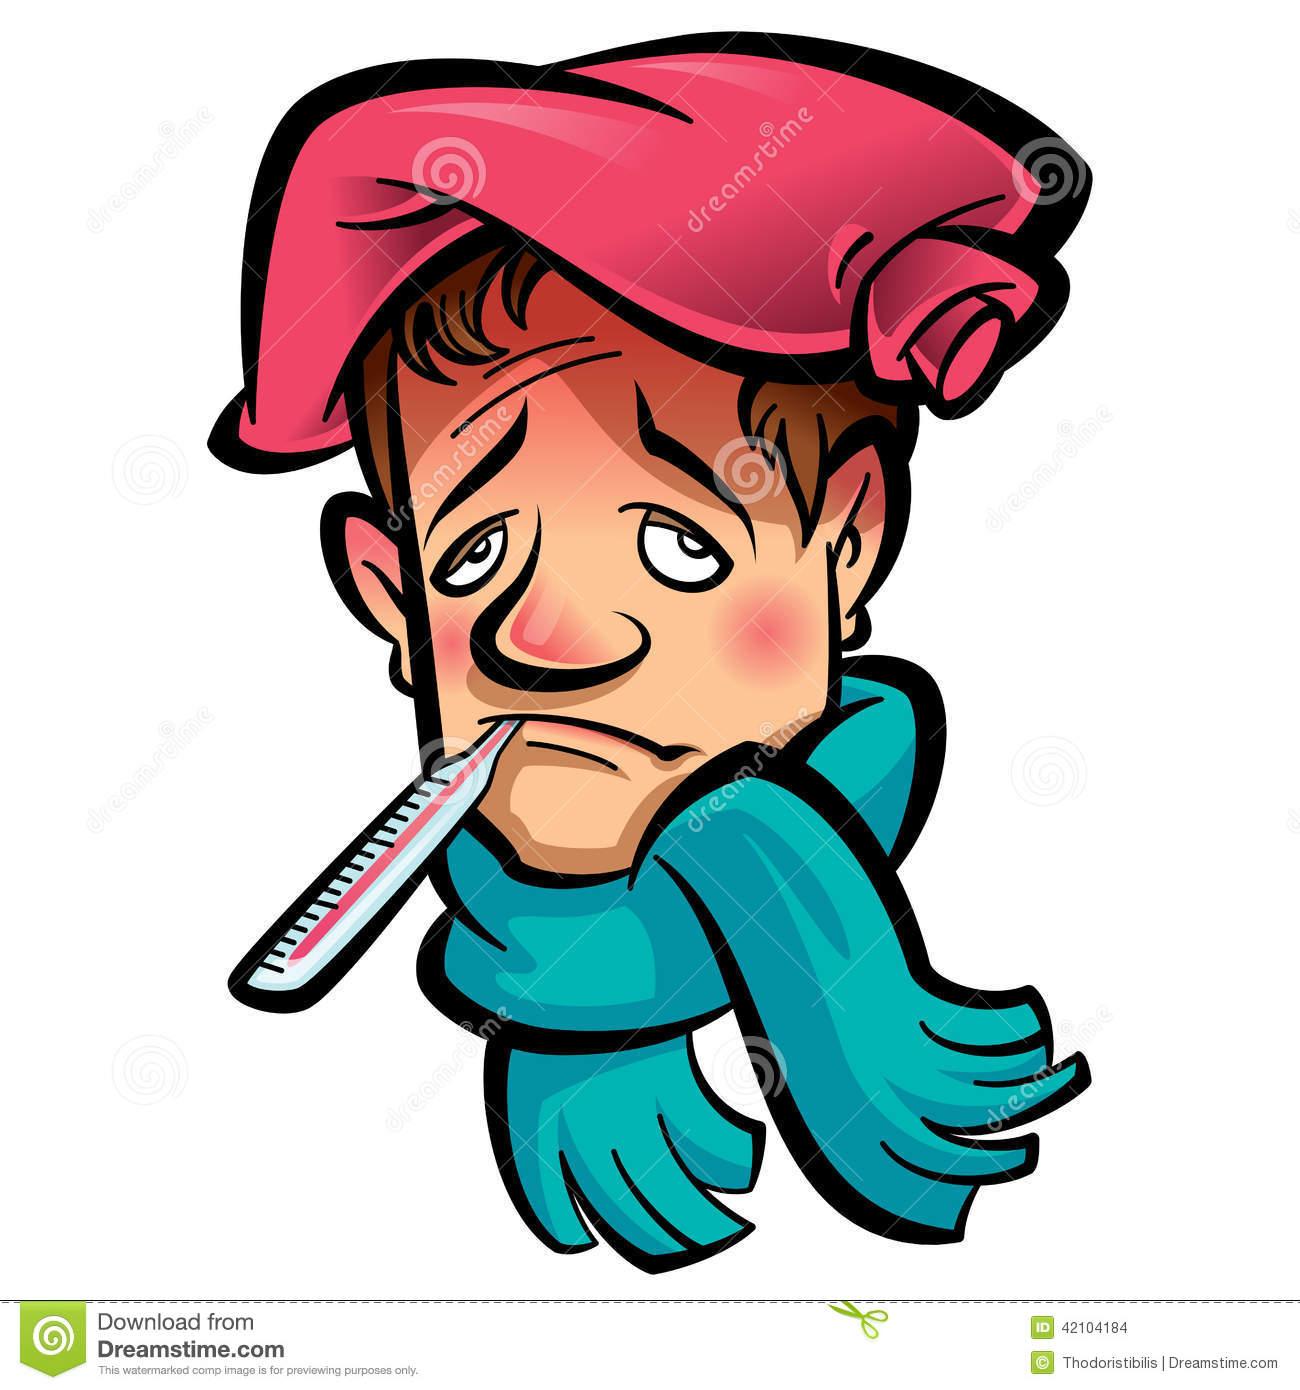 Sick person clipart clip art freeuse stock Sick person clipart 7 » Clipart Station clip art freeuse stock